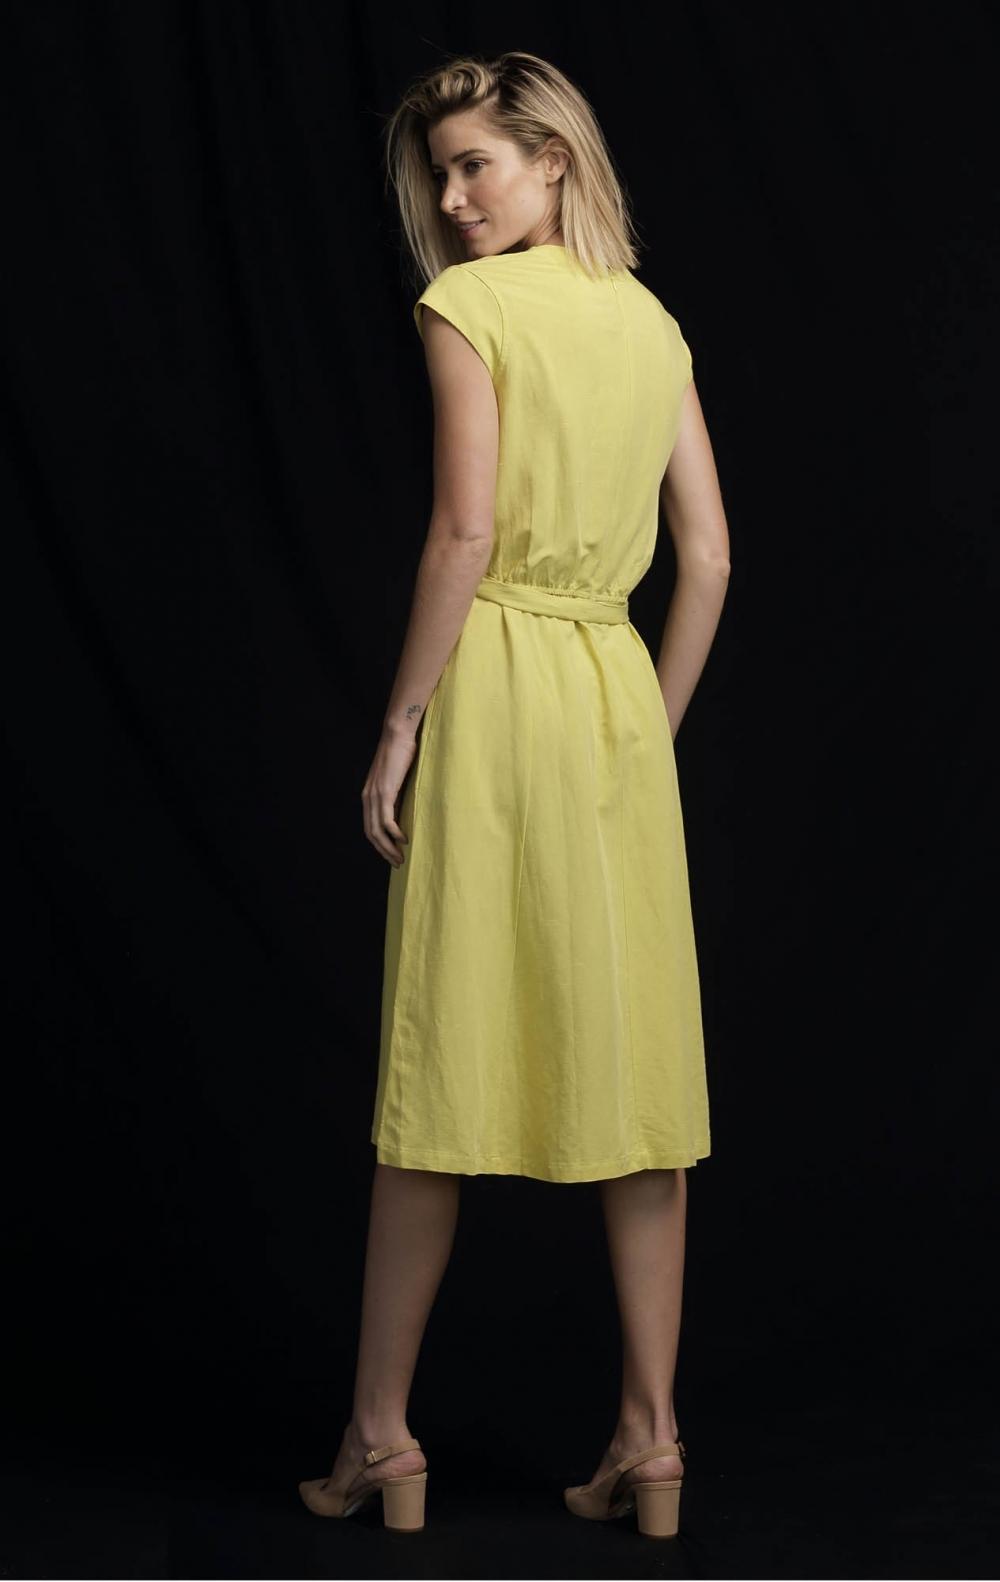 Vestido Linho Midi Cinto Lima   - Foto 2